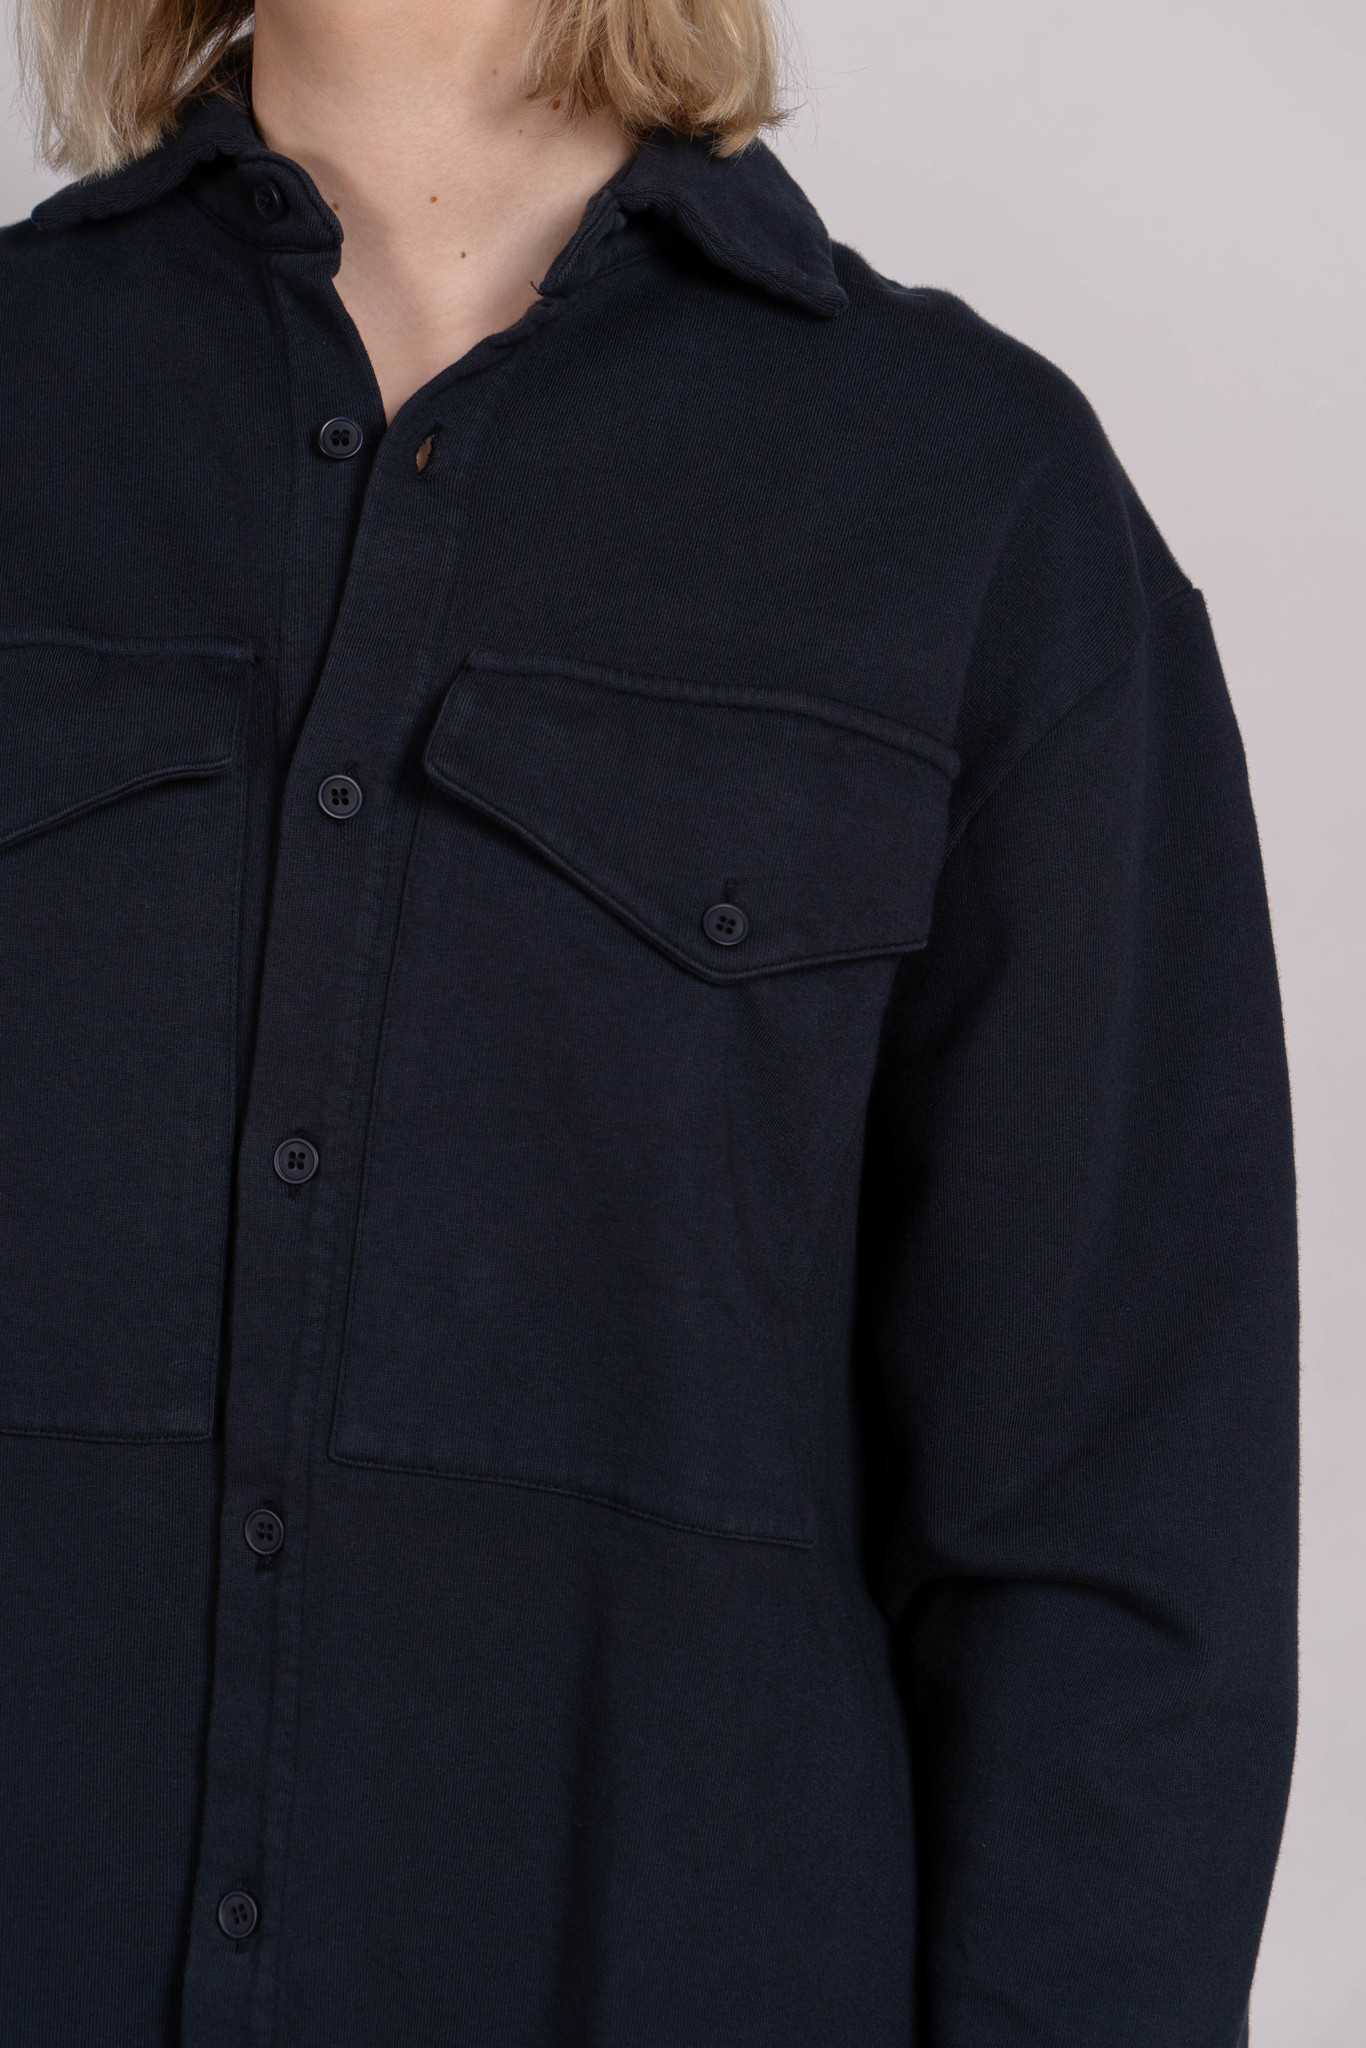 Unisex Shirt Diego French Terry Dark Navy